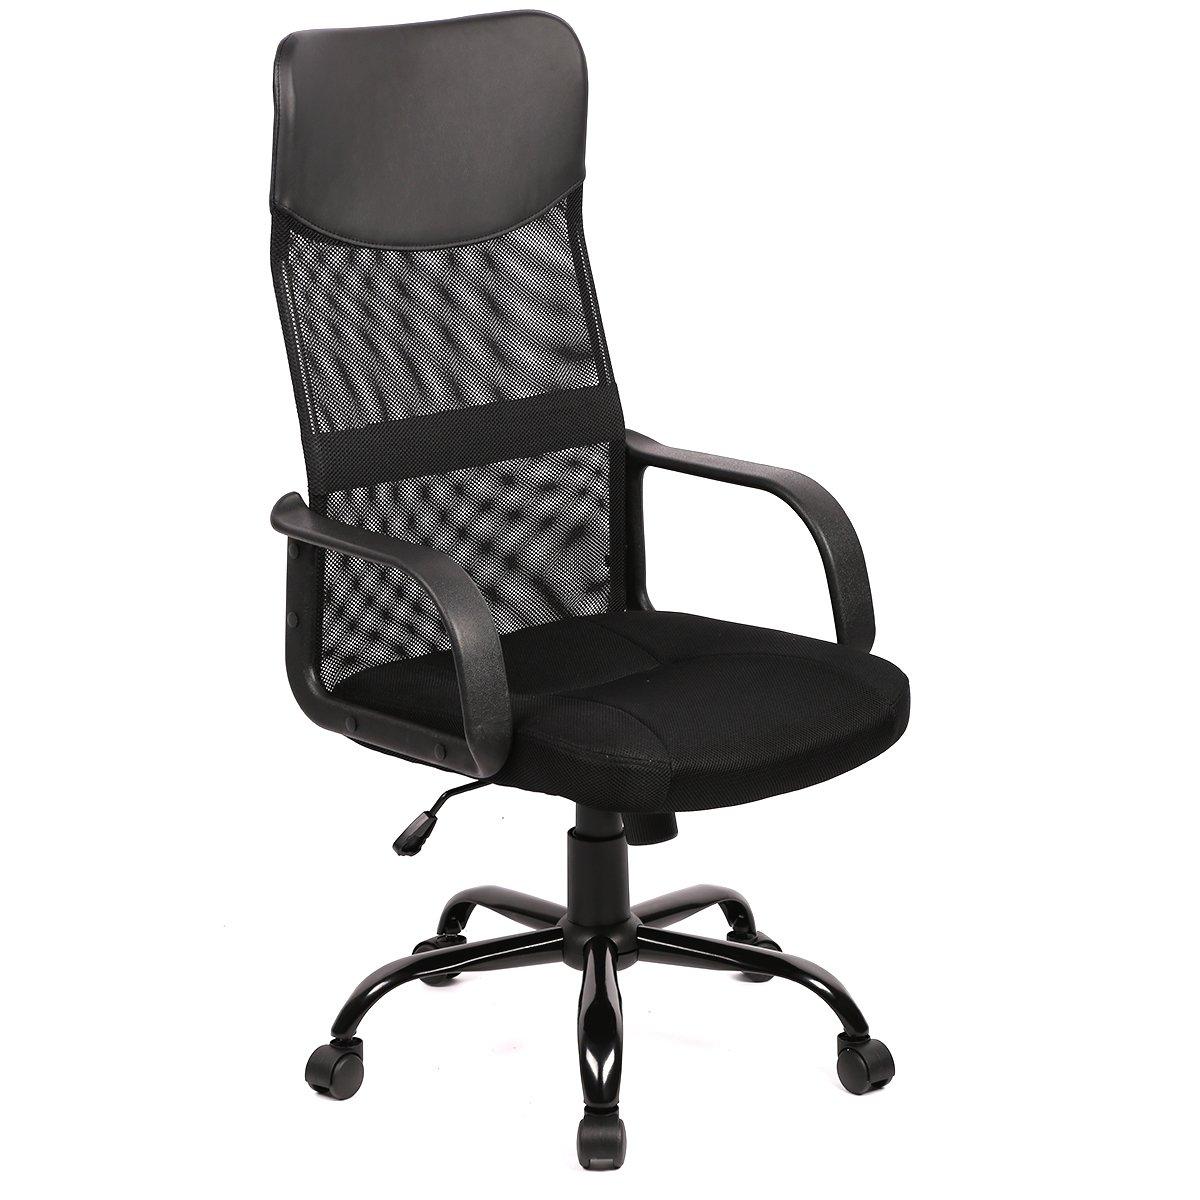 Amazoncom New Black Modern Fabric Mesh High Back Office Task